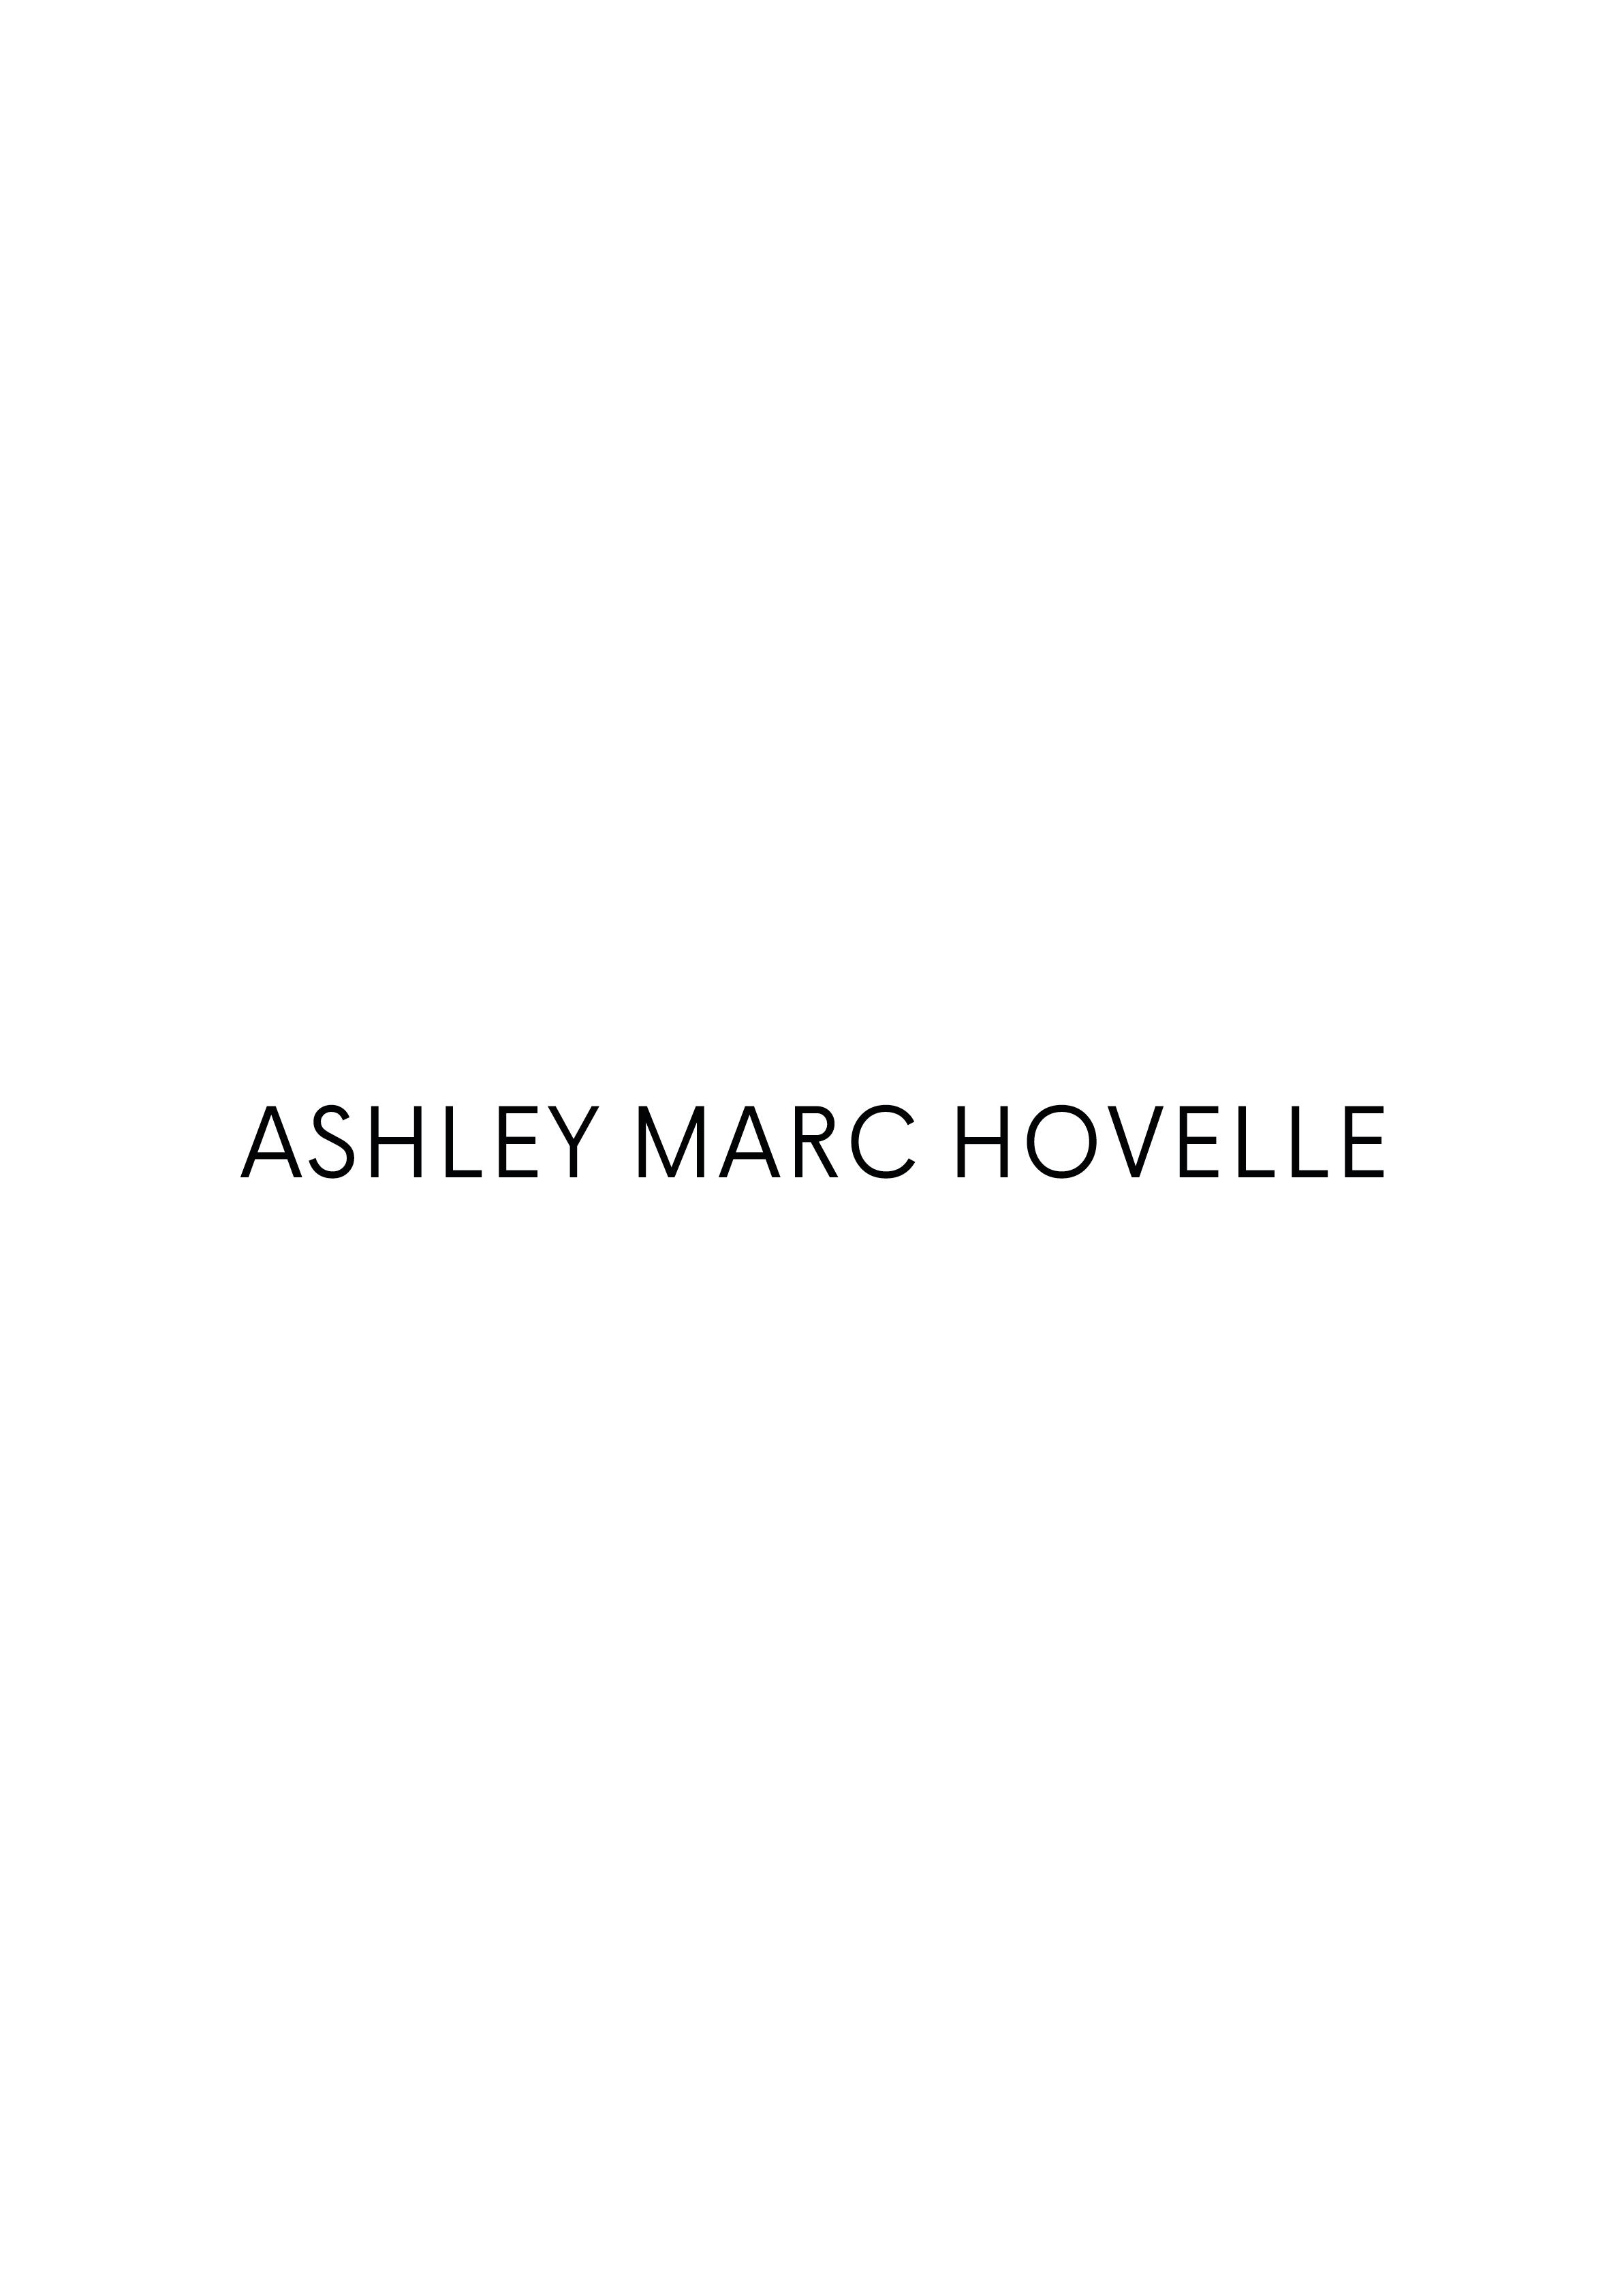 Ashley Marc Hovelle SS19 vibes37.jpg